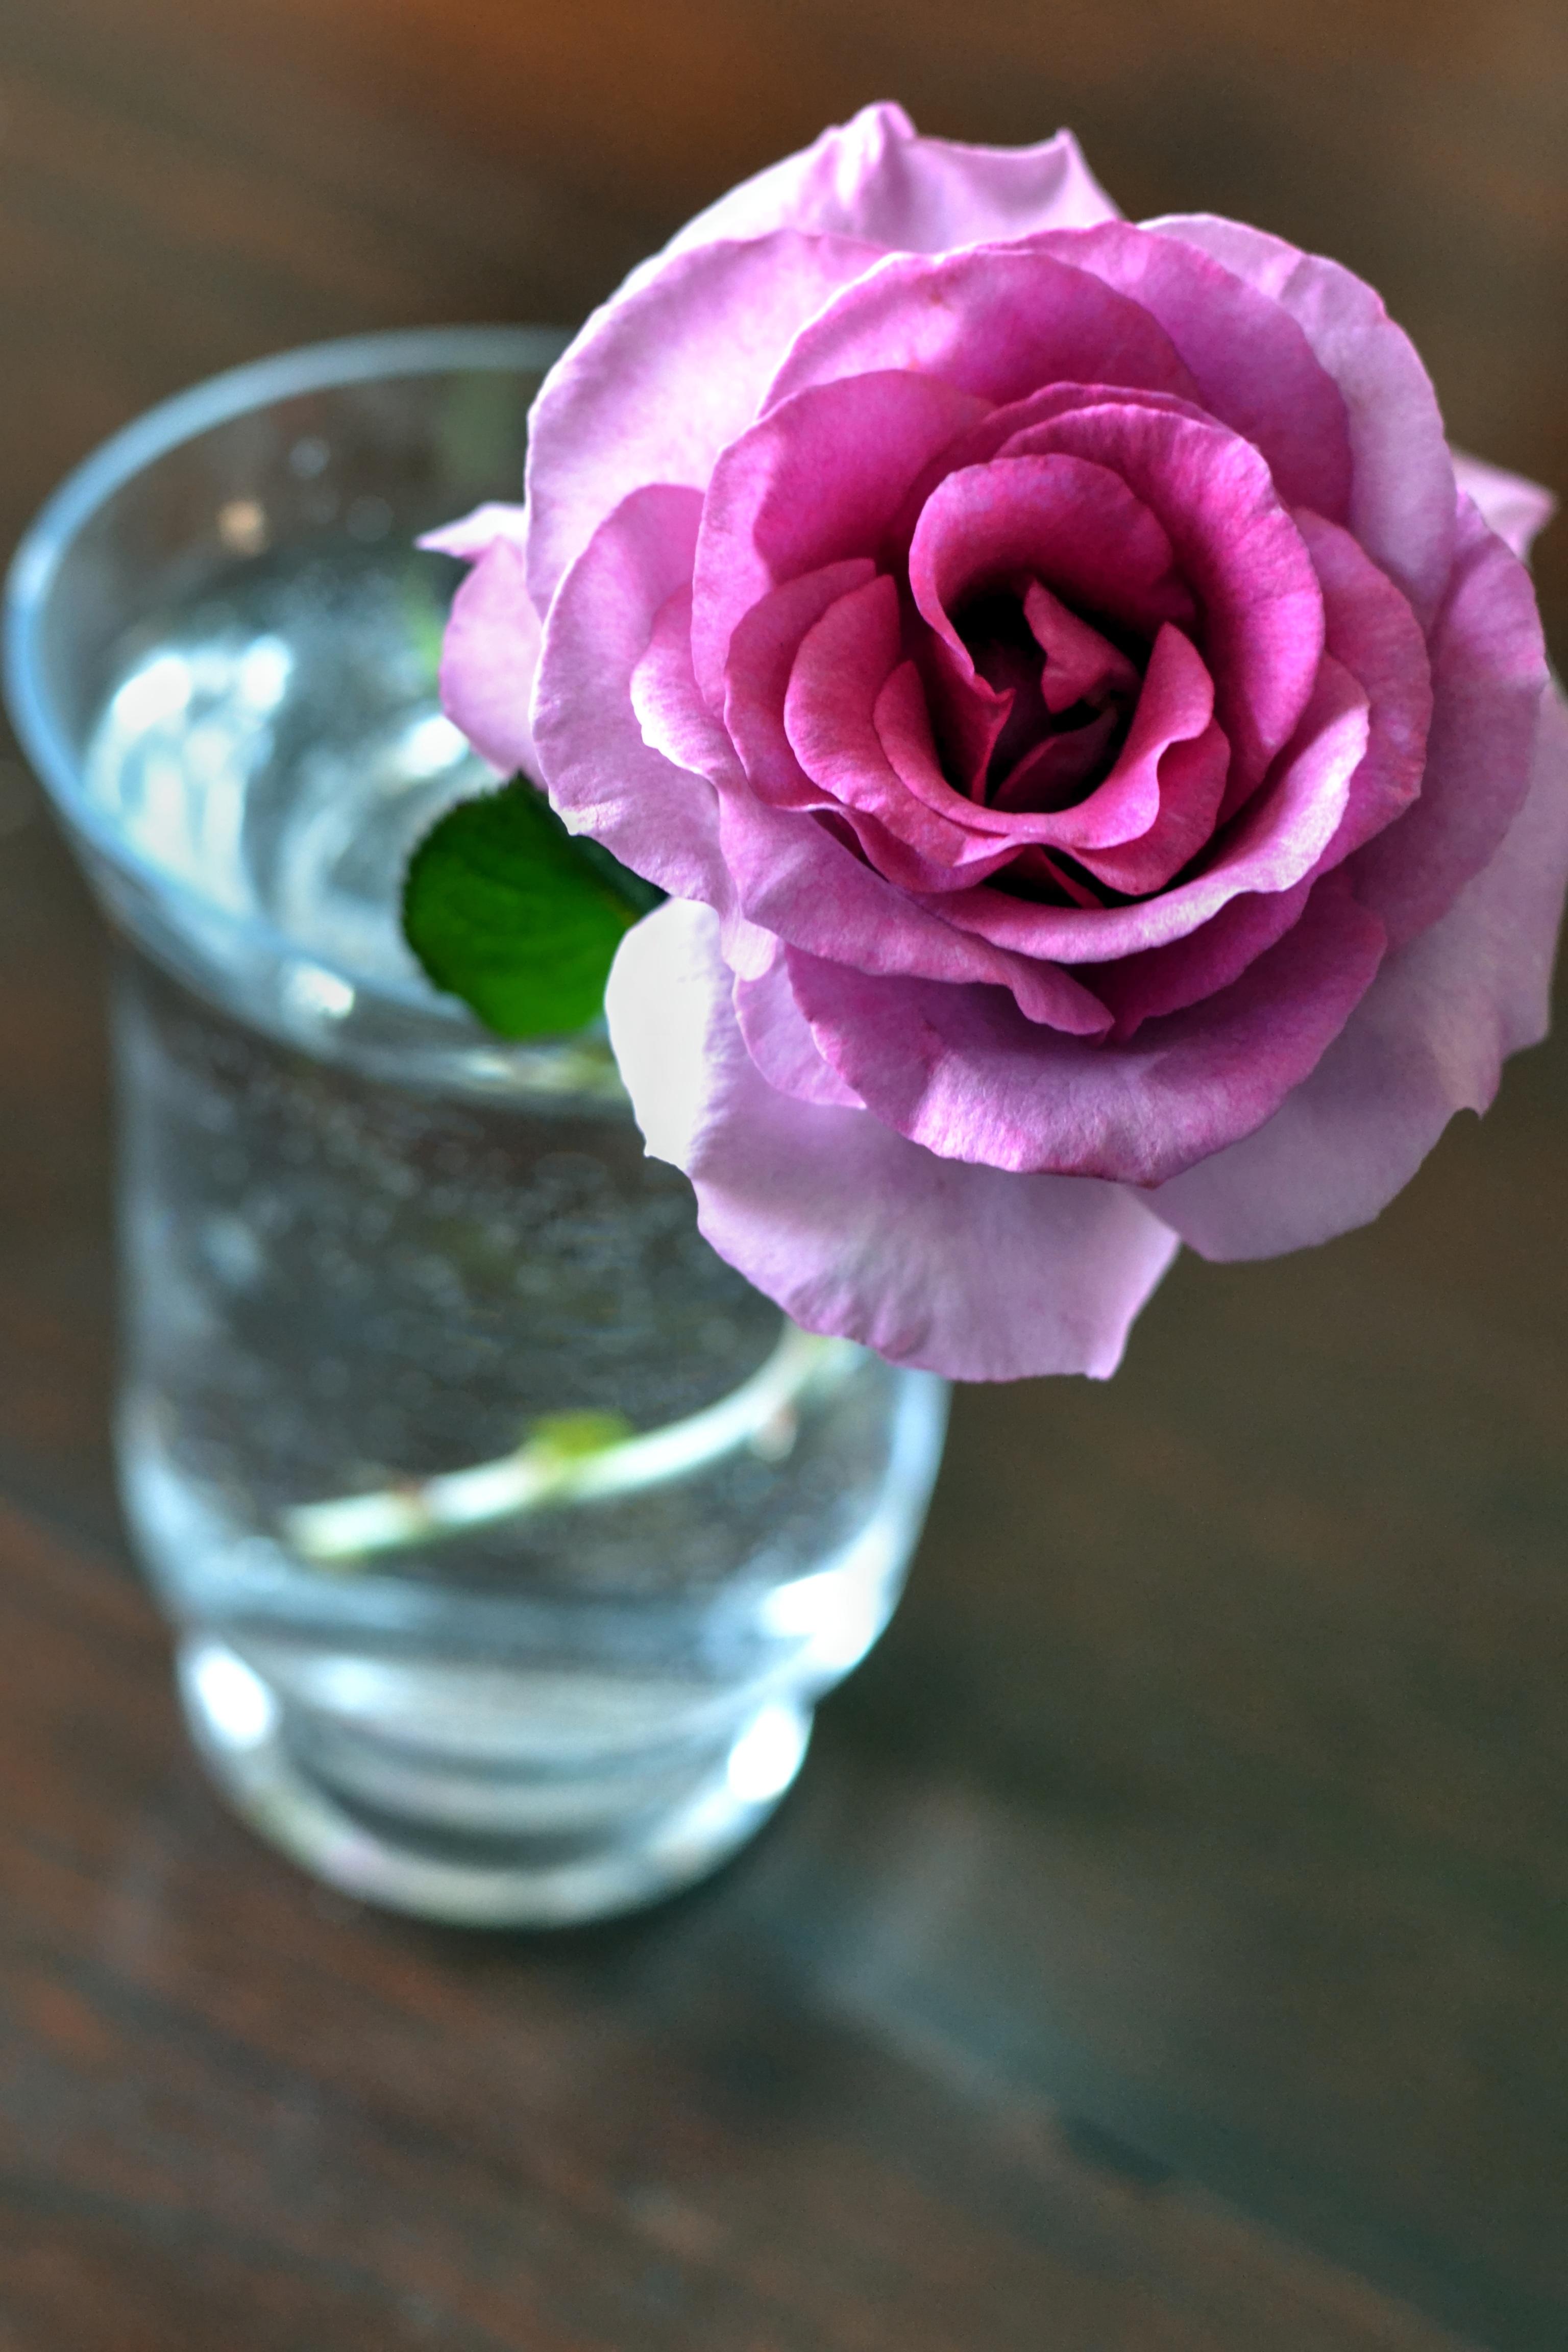 menanam bunga ungu daun bunga mawar musim semi berwarna merah muda pot bunga mawar merah muda